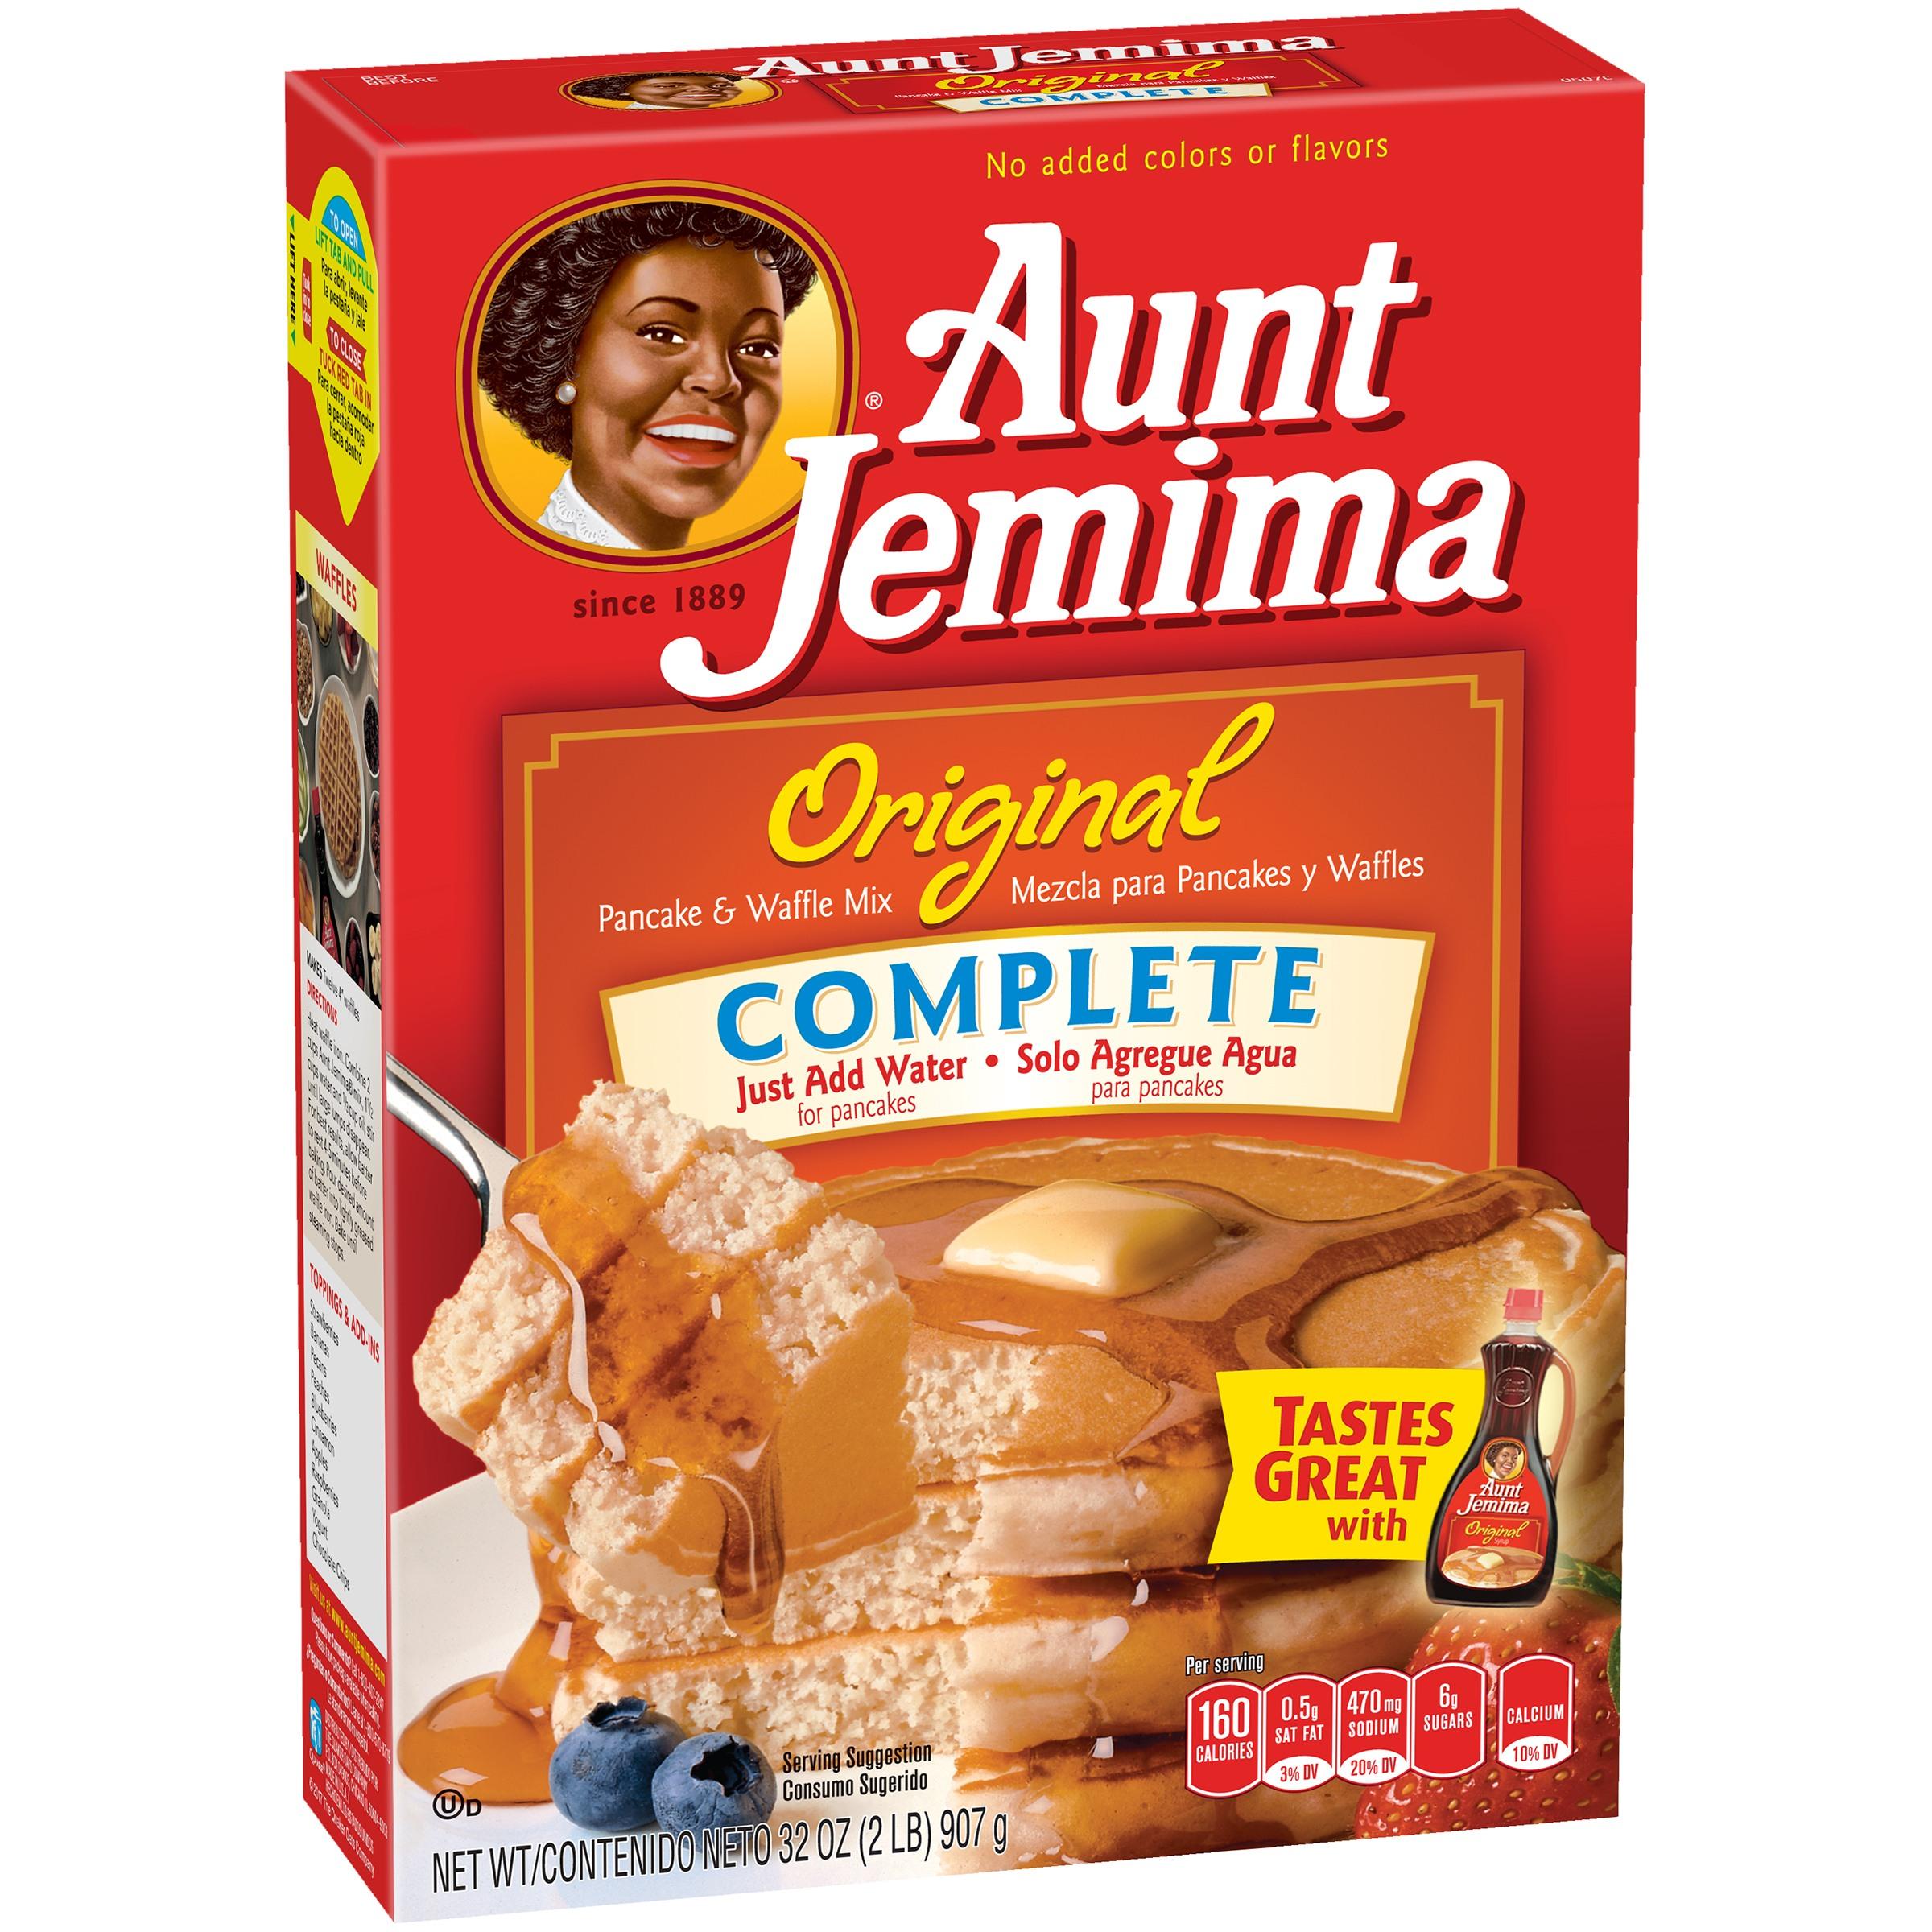 Aunt Jemima Original Complete Pancake & Waffle Mix 32 oz. Box